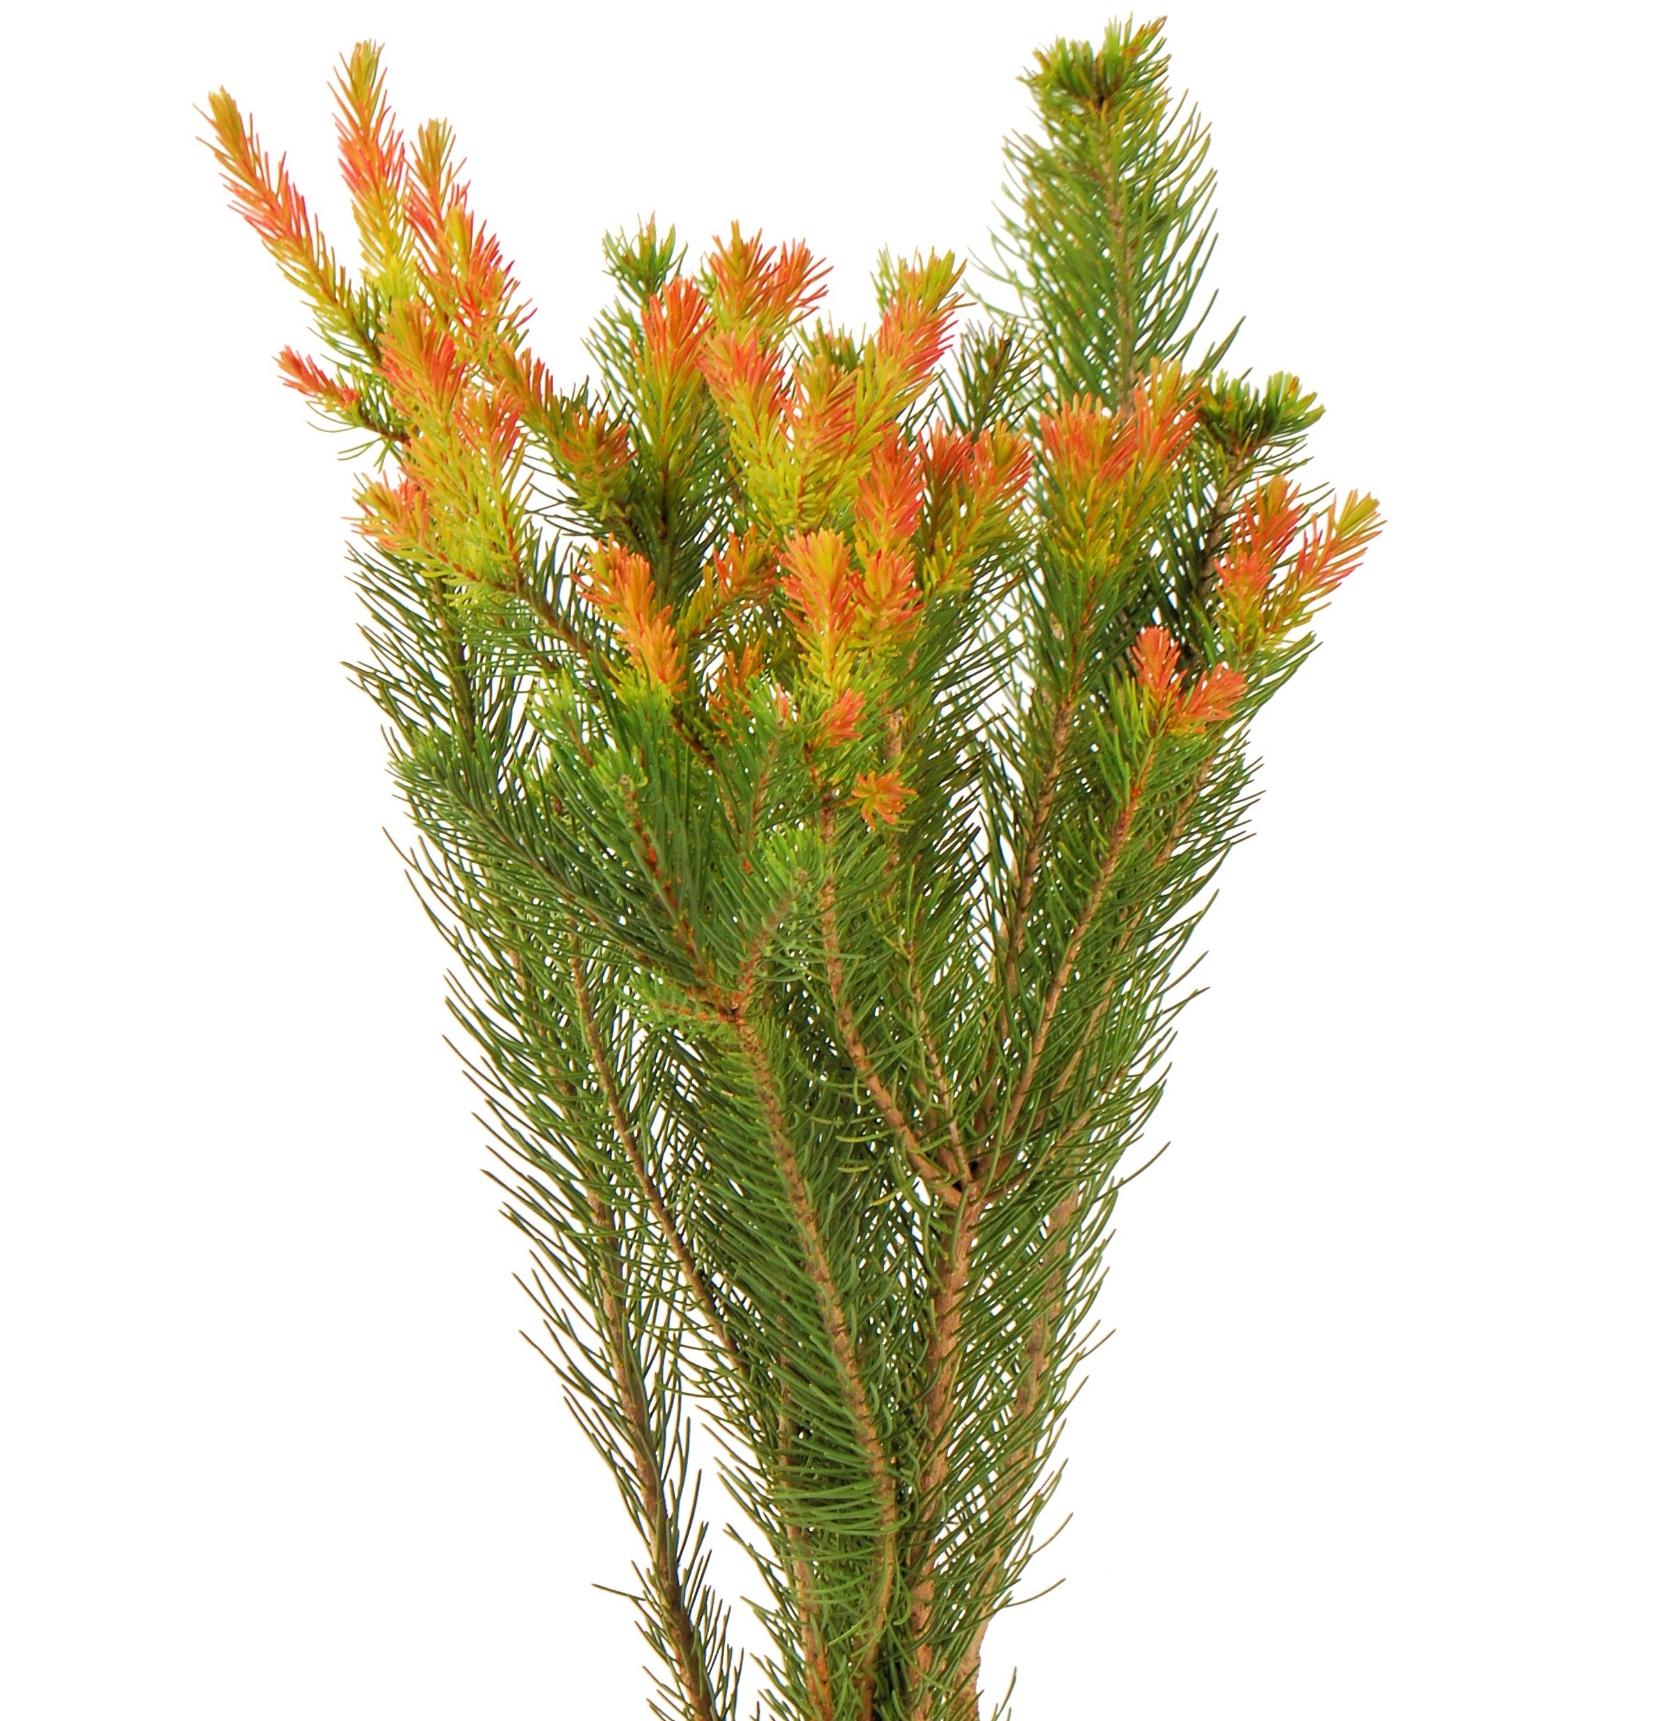 Australia Pine Bunch.JPG